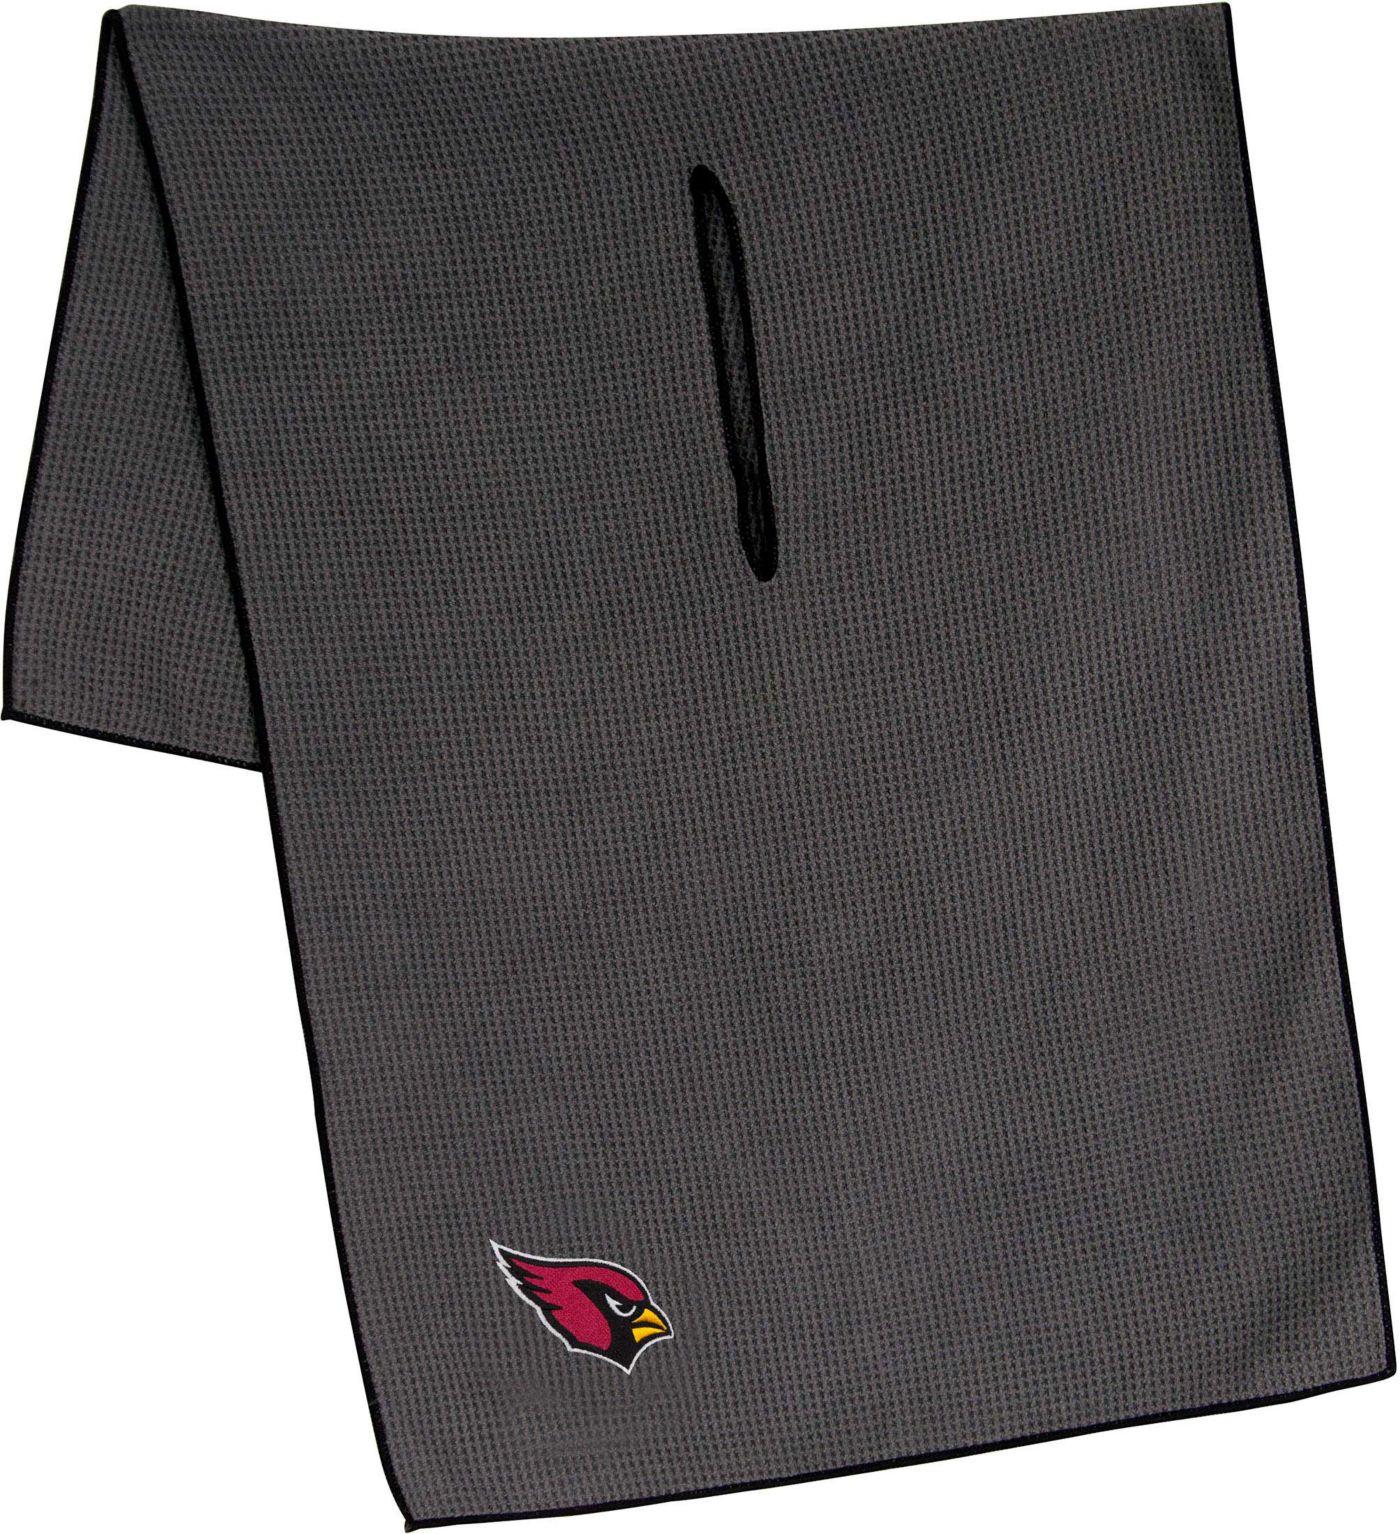 "Team Effort Arizona Cardinals 19"" x 41"" Microfiber Golf Towel"